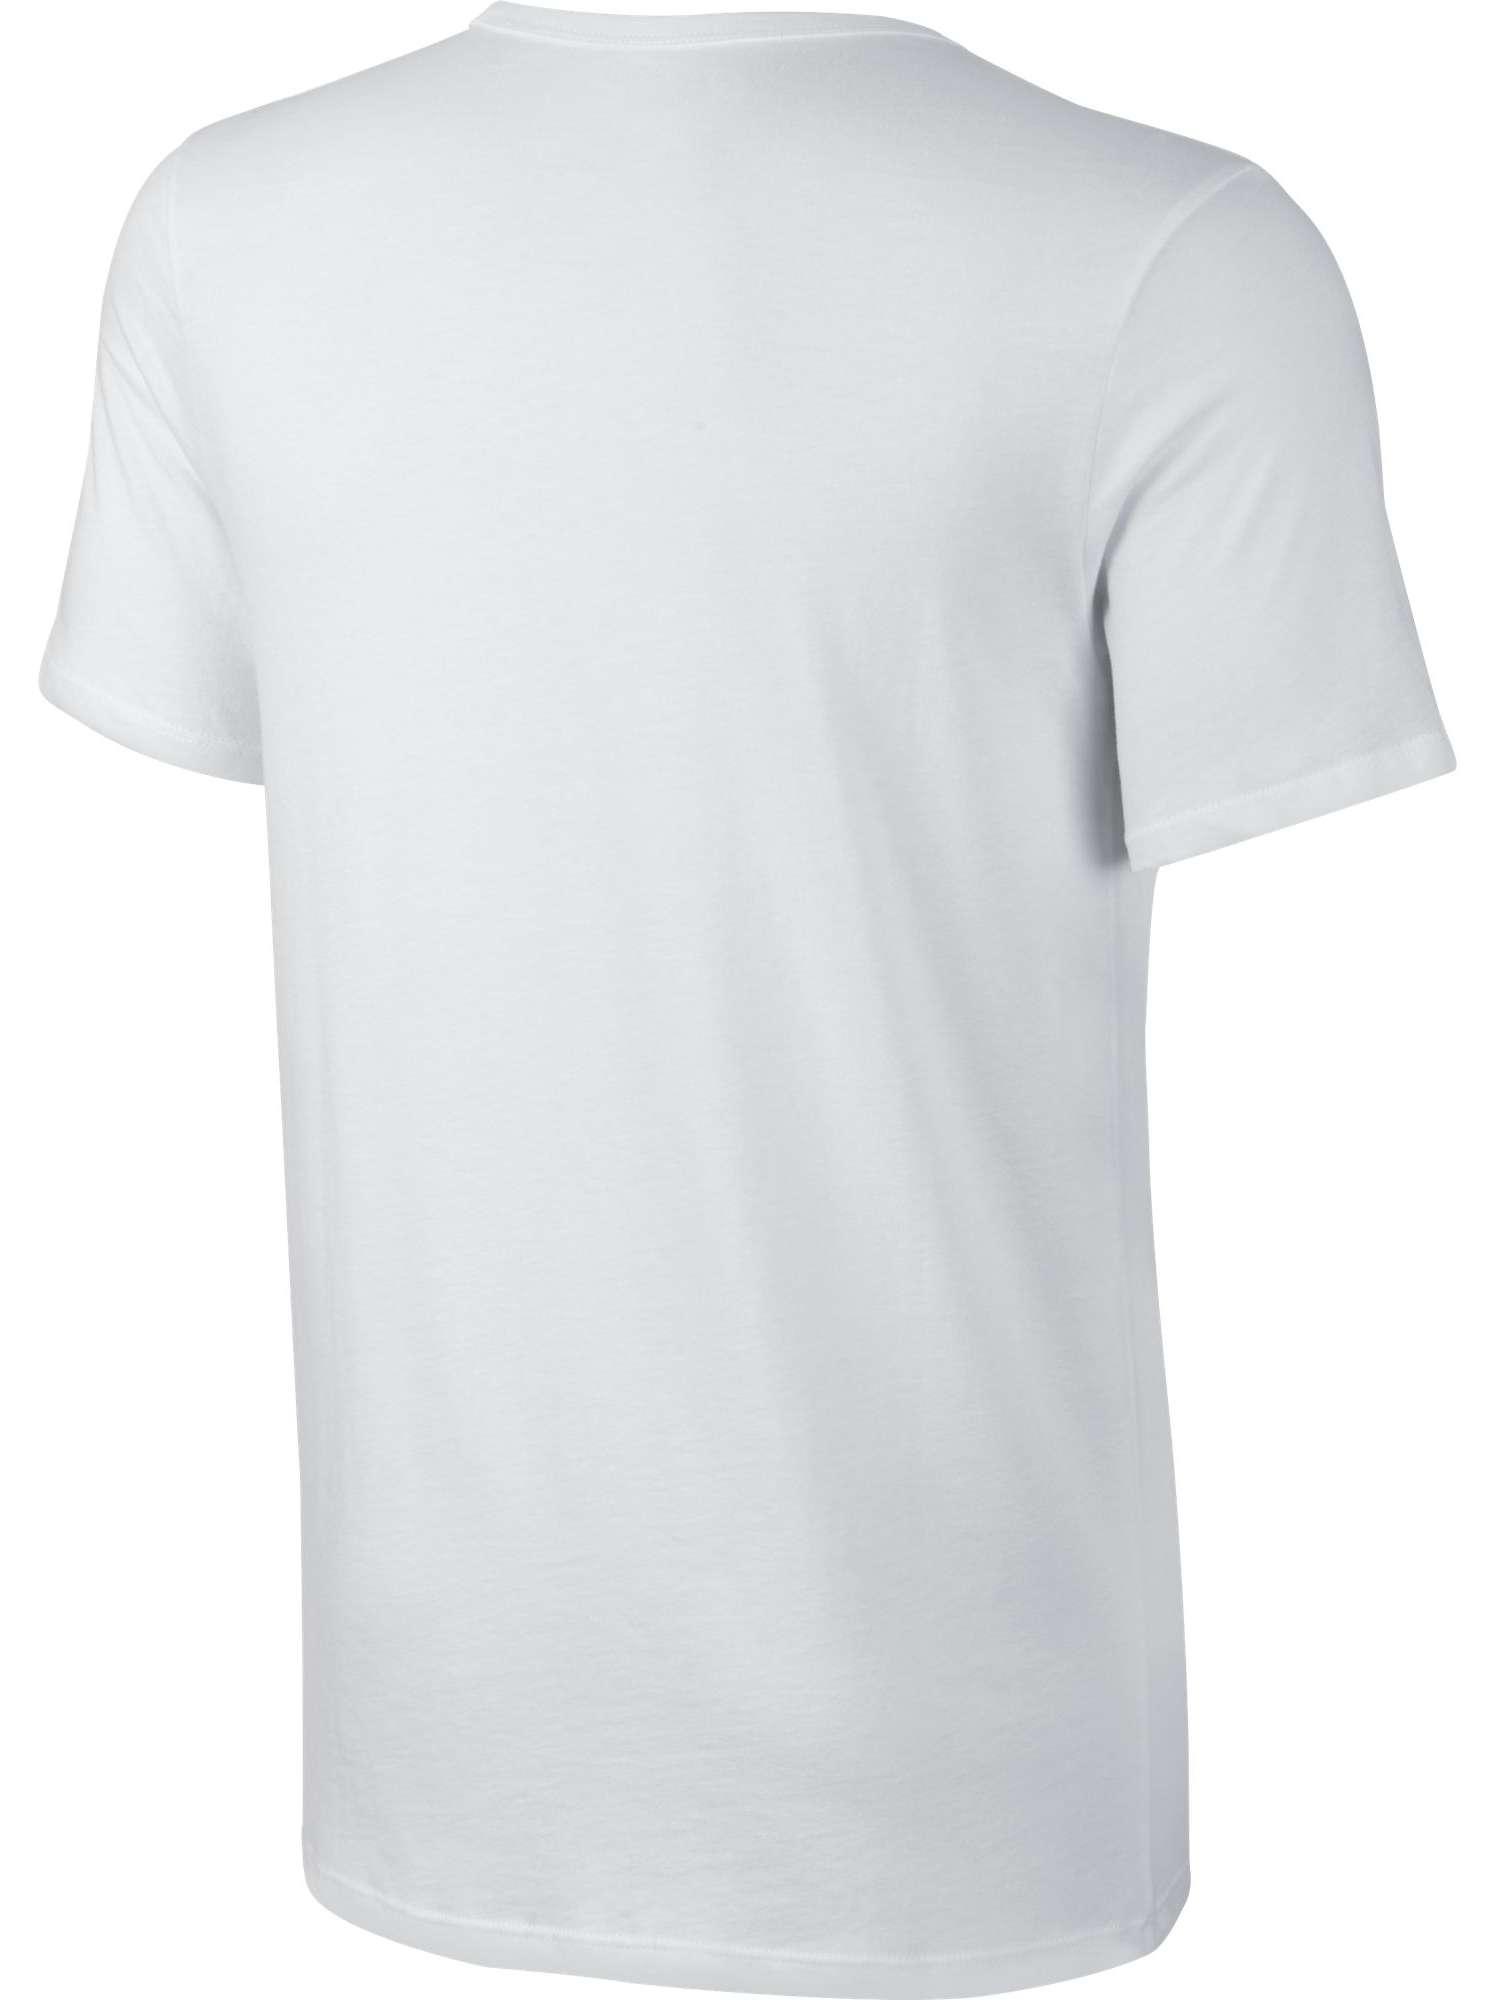 Nike AMP TENNIS STREET COURT TEE. Pánské triko ... aee3e0047a5